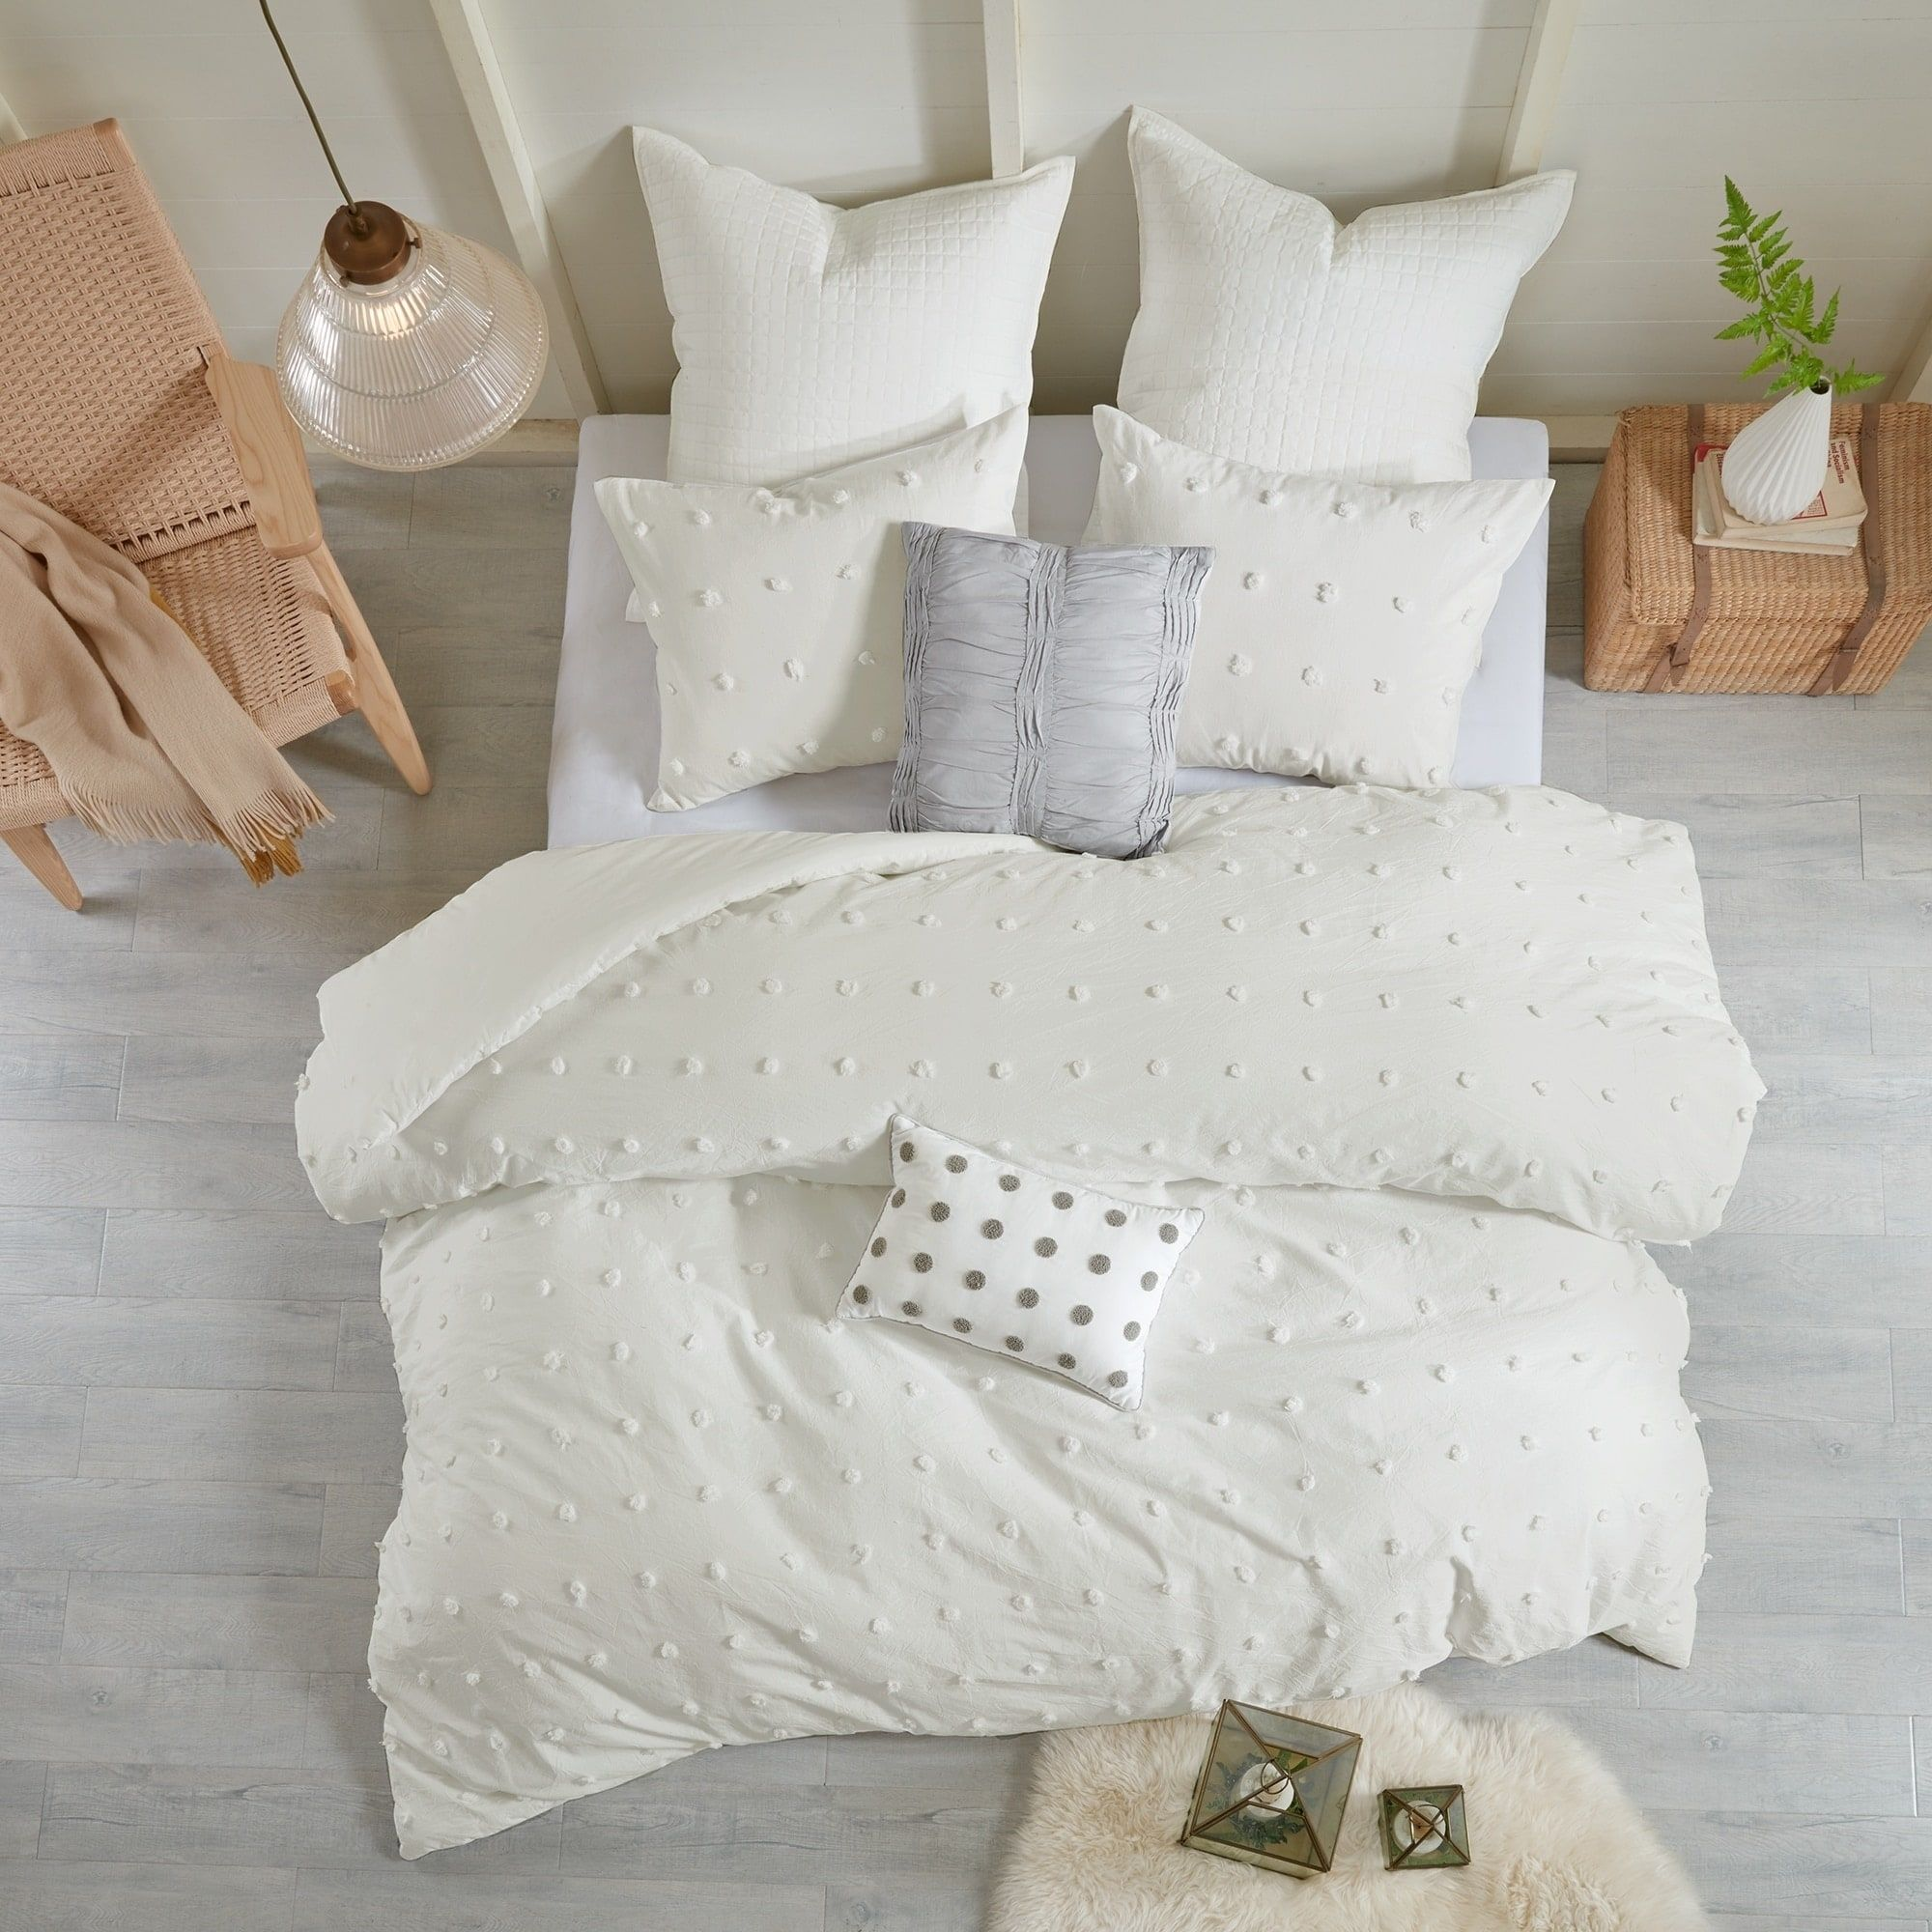 Amazon Com Opcloud Bedding Duvet Cover Set 600tc Queen Cotton Luxury Soft Floral Comforter Cover Set 1 Du Duvet Cover Sets Rustic Duvet Cover Bed Duvet Covers